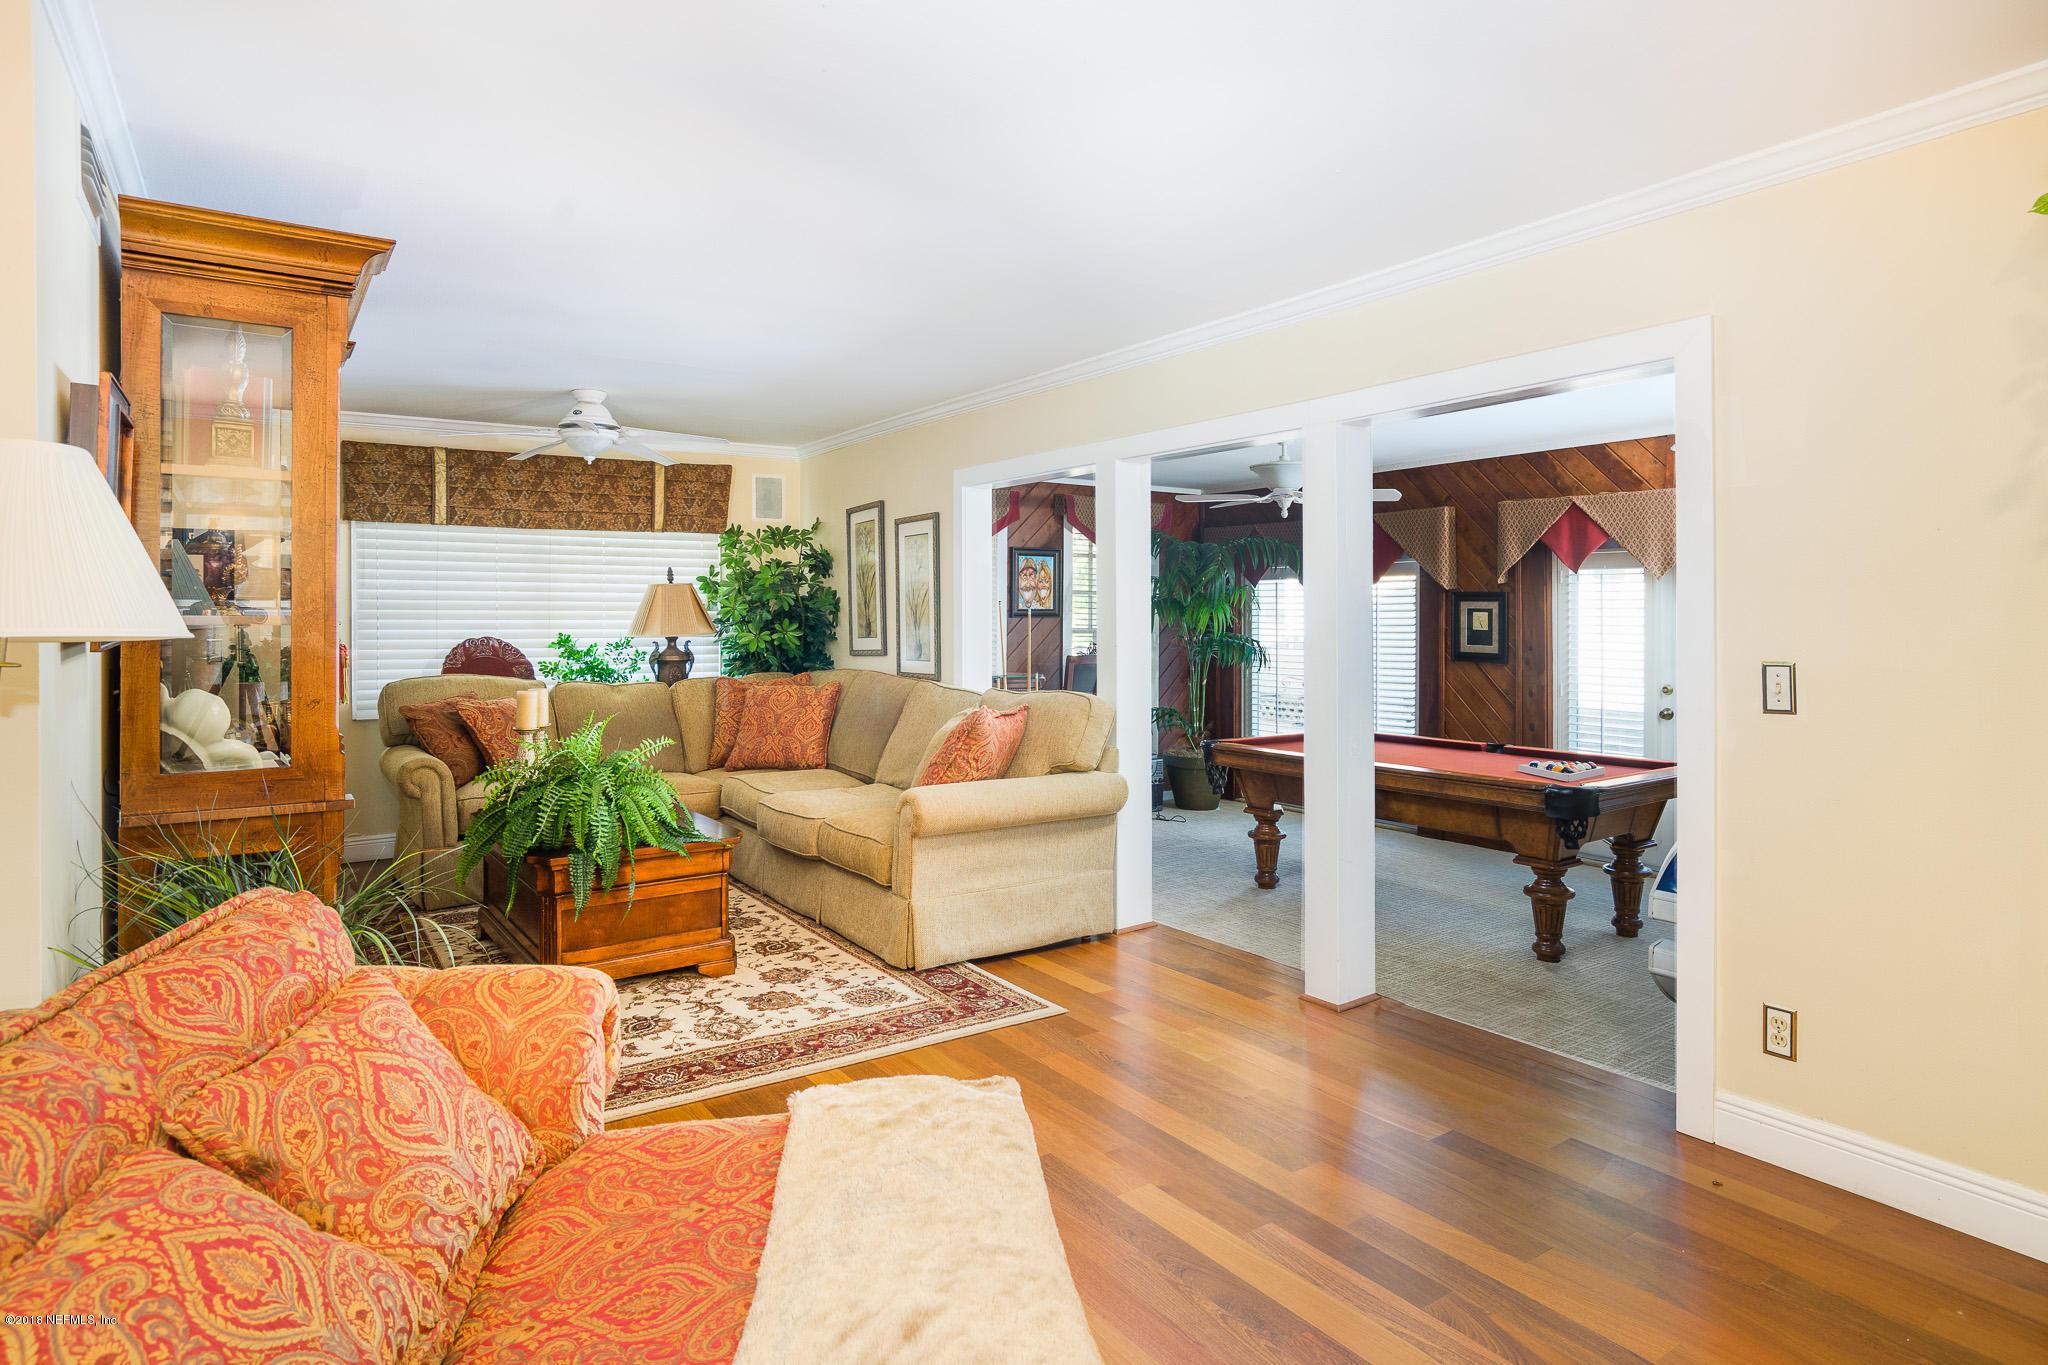 2463 FORT LANE, GENEVA, FLORIDA 32732, 3 Bedrooms Bedrooms, ,2 BathroomsBathrooms,Residential - single family,For sale,FORT LANE,929180